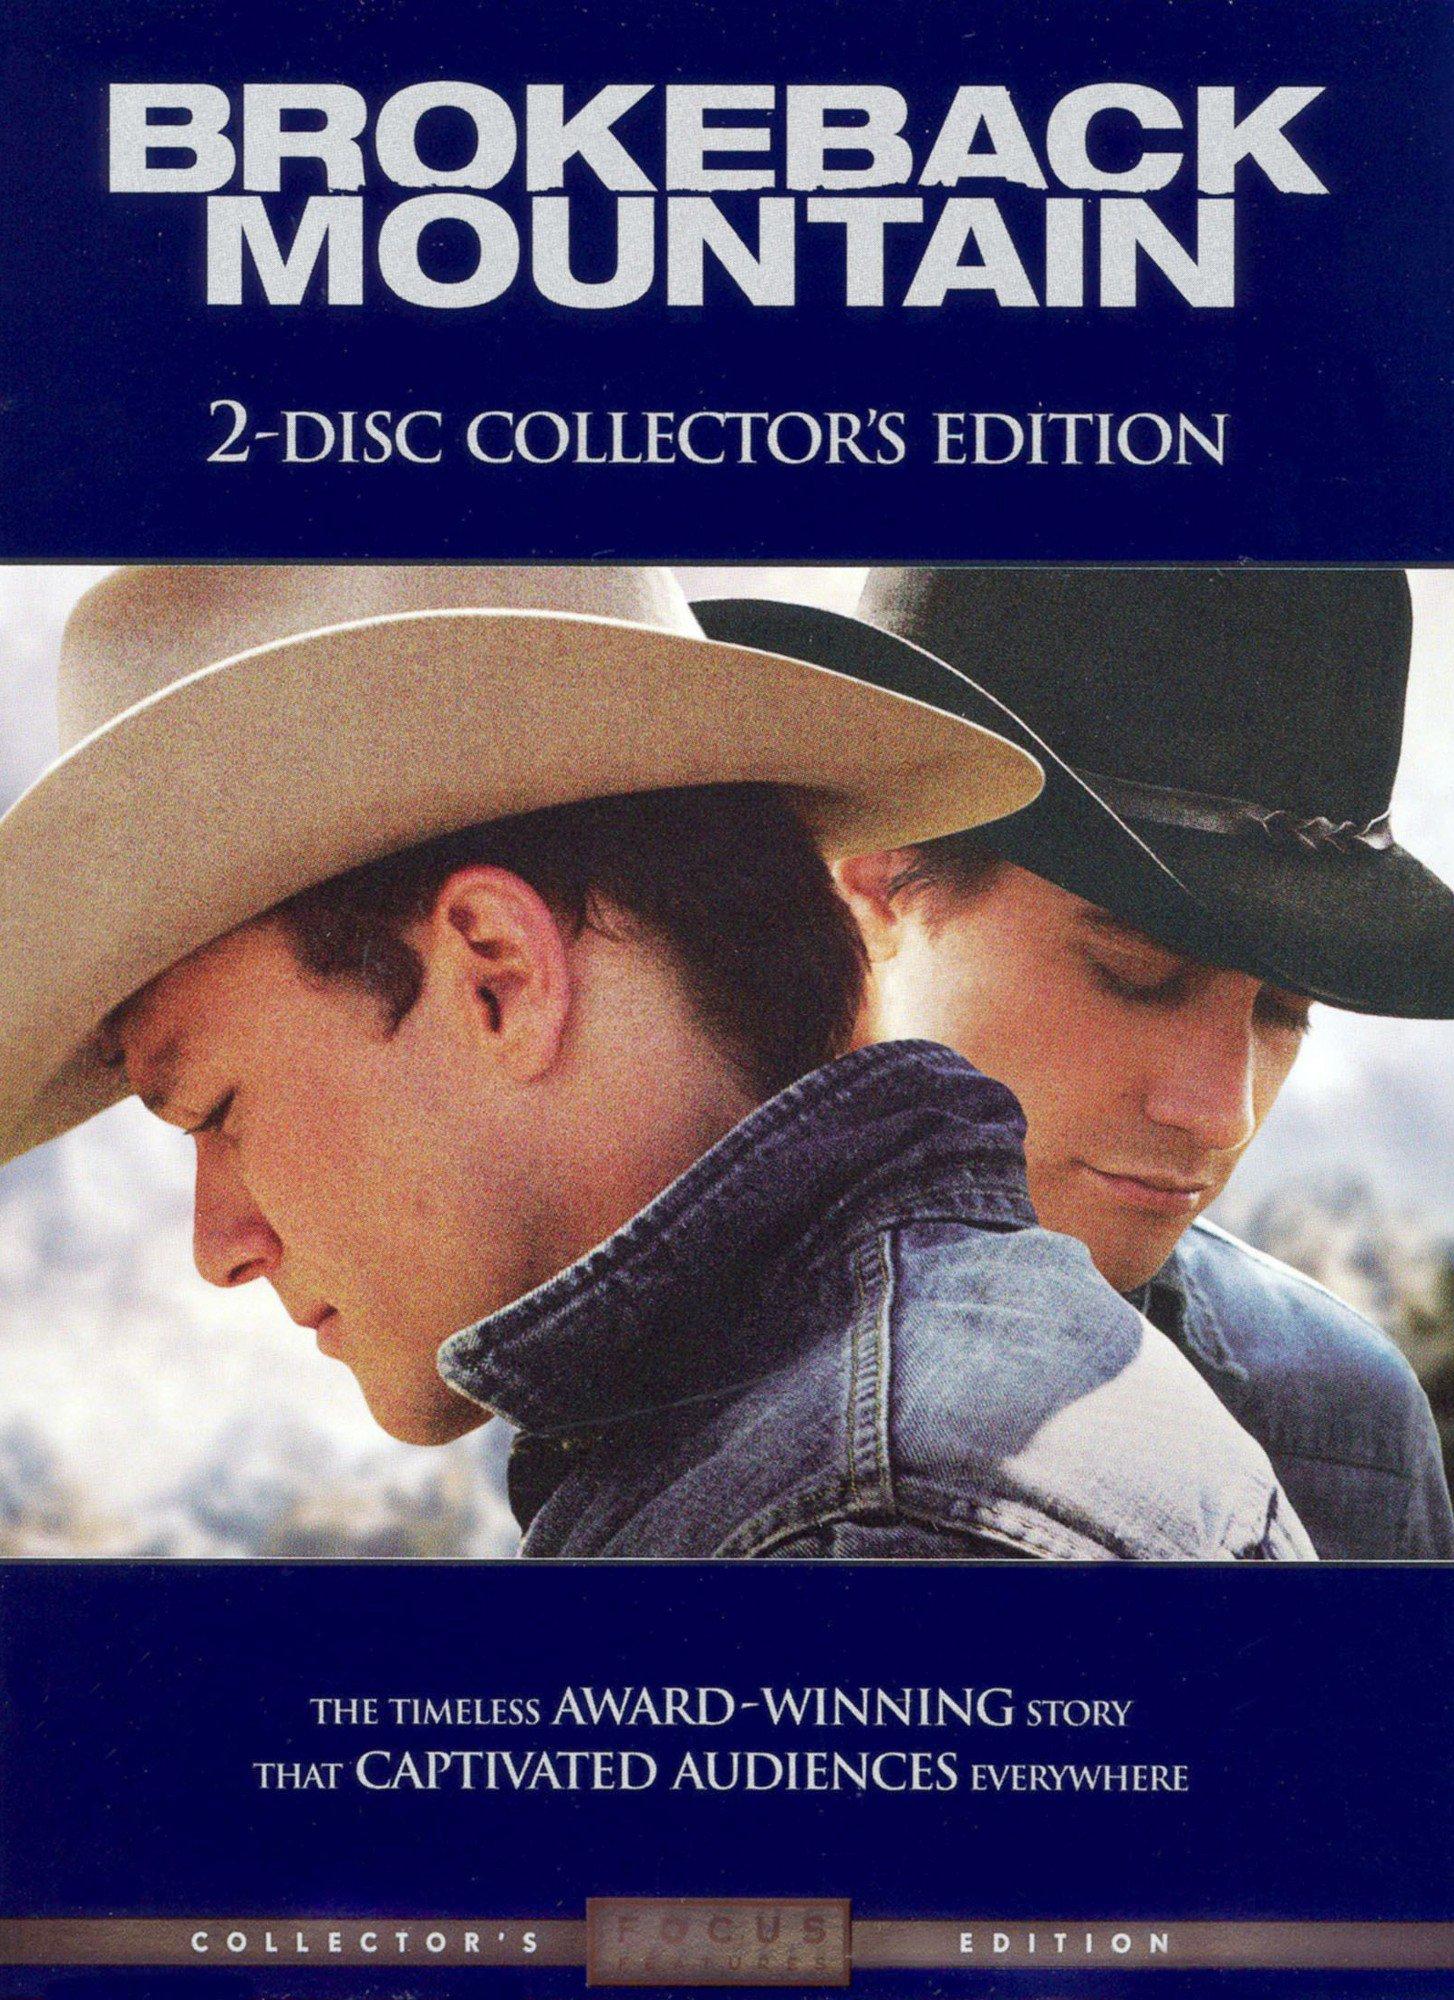 Dvd Review Brokeback Mountain  Slant Magazine Dvd Review Brokeback Mountain